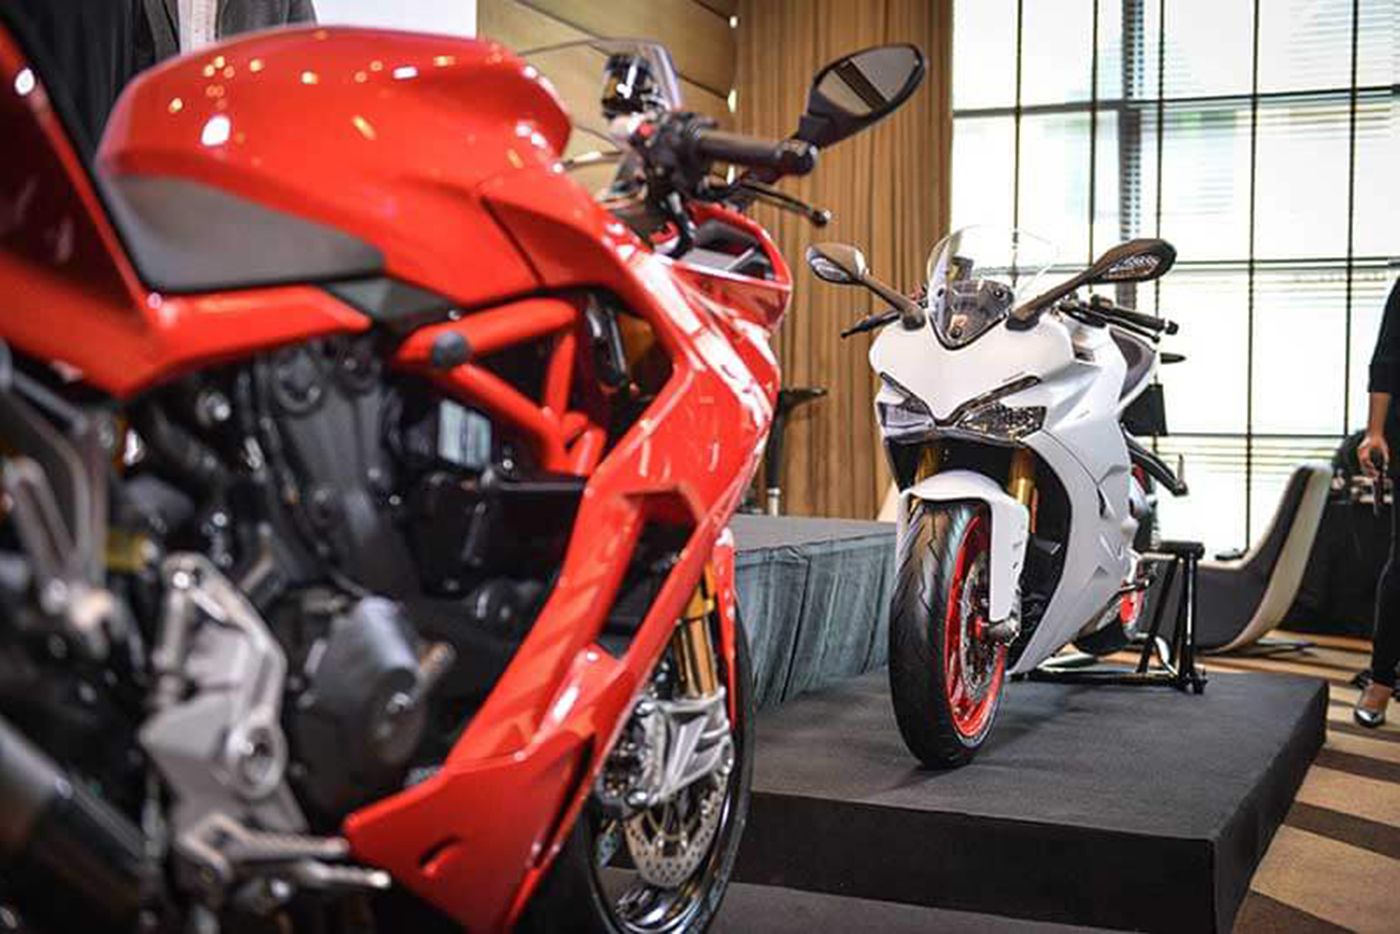 Ducati SuperSport 2017 – Đối thủ Kawasaki Ninja 1000 sắp về Việt Nam - ảnh 3